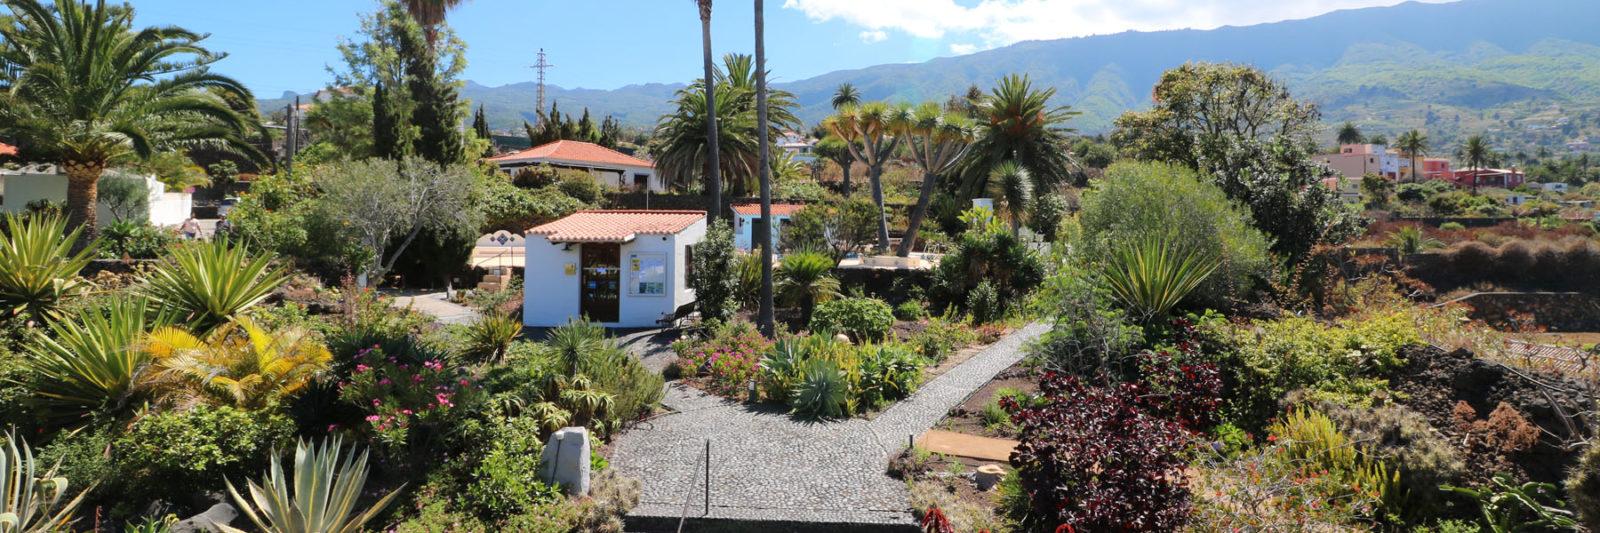 La Palma - Apartments Miranda - Garden